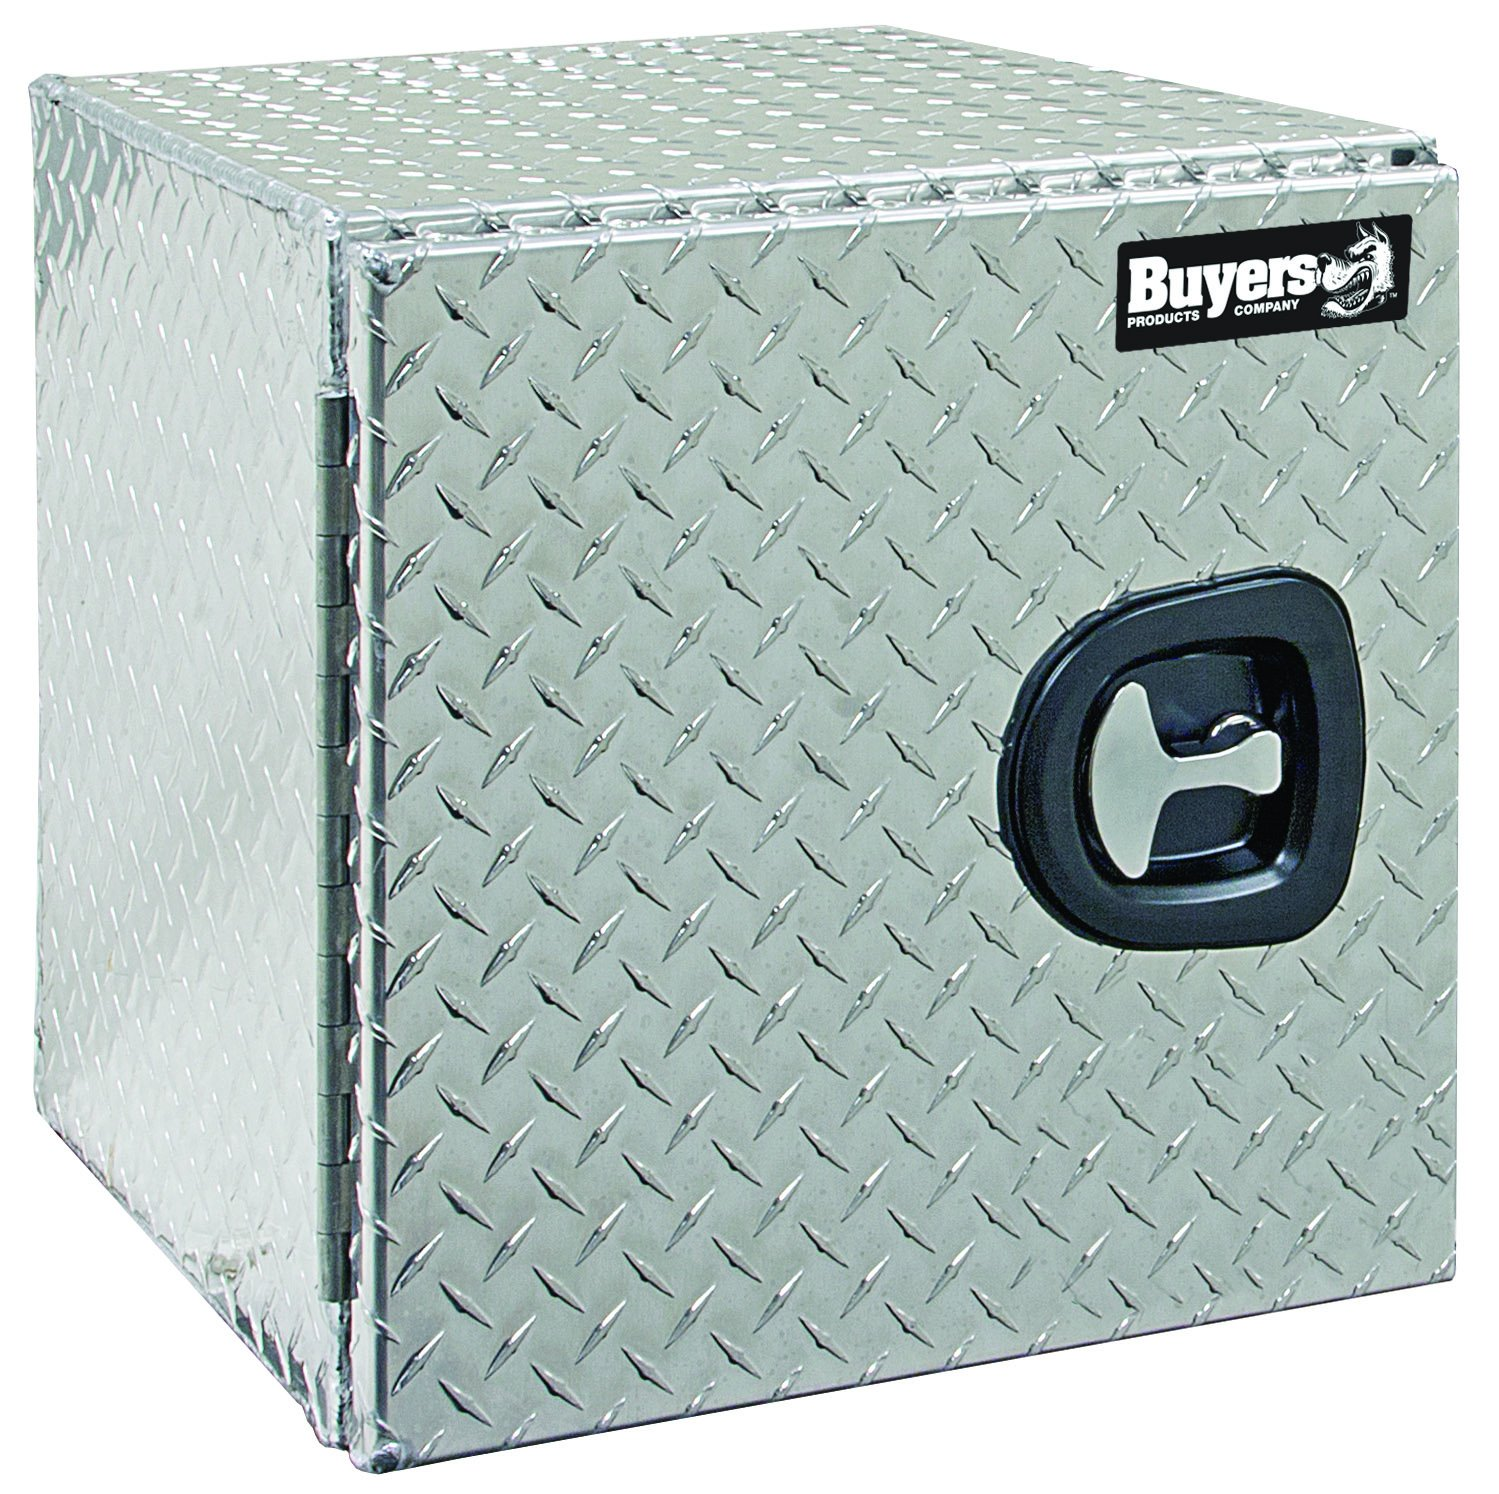 Buyers Products 1705200 Diamond Tread Aluminum Underbody Truck Box w/Barn Door (18x18x24 Inch) by Buyers Products